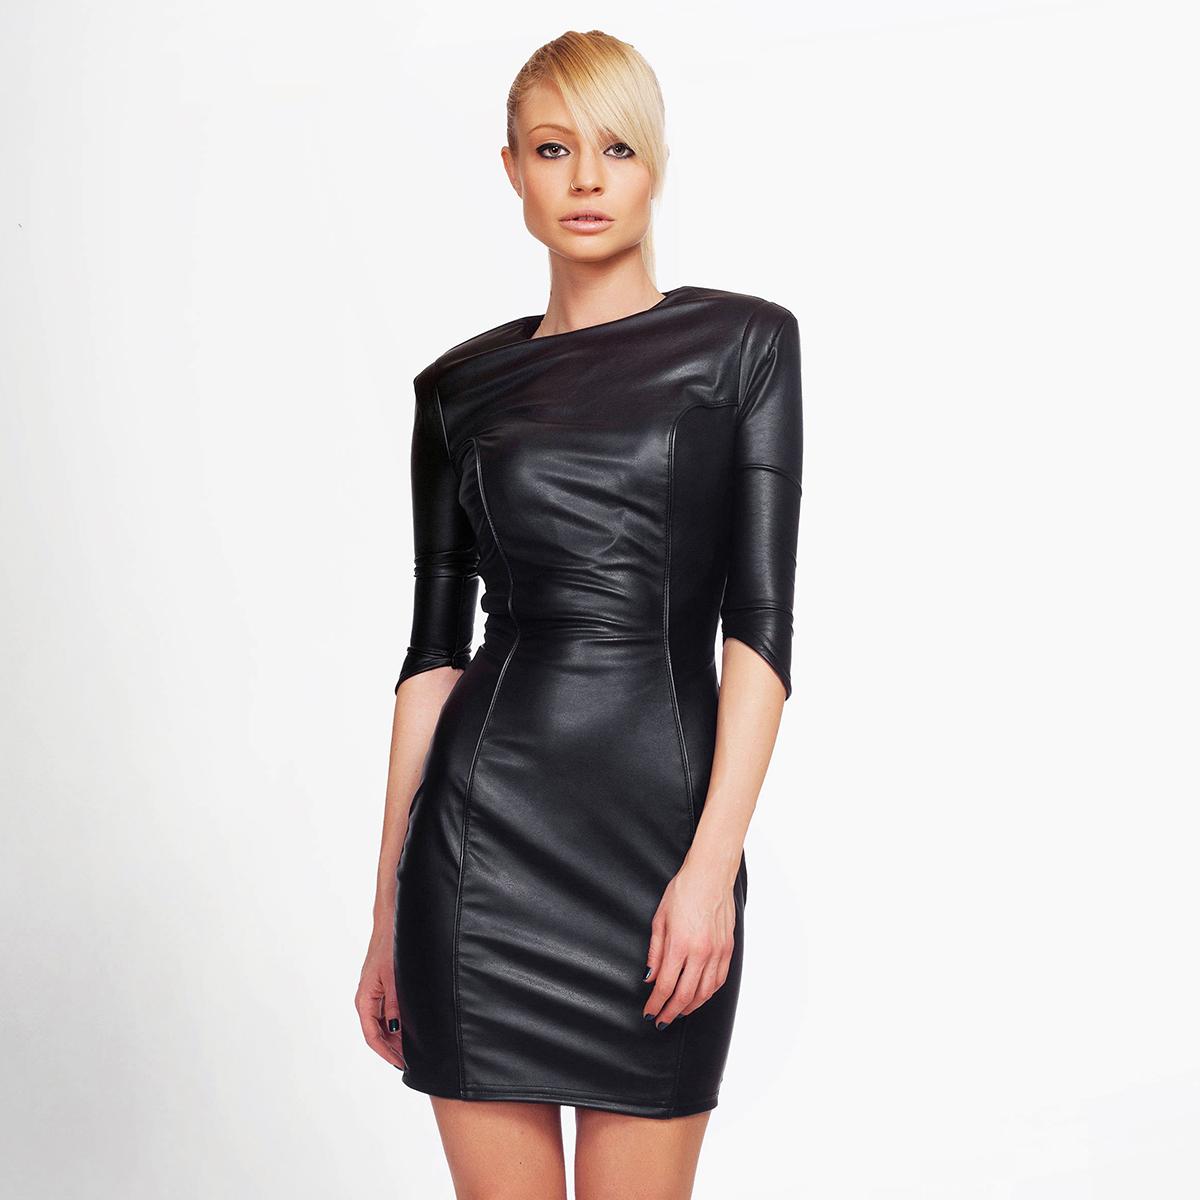 rebelsmarket_black_vegan_leather_dress_cocktail_dress_bodycon_dress_sexy_lbd_dresses_5.jpg